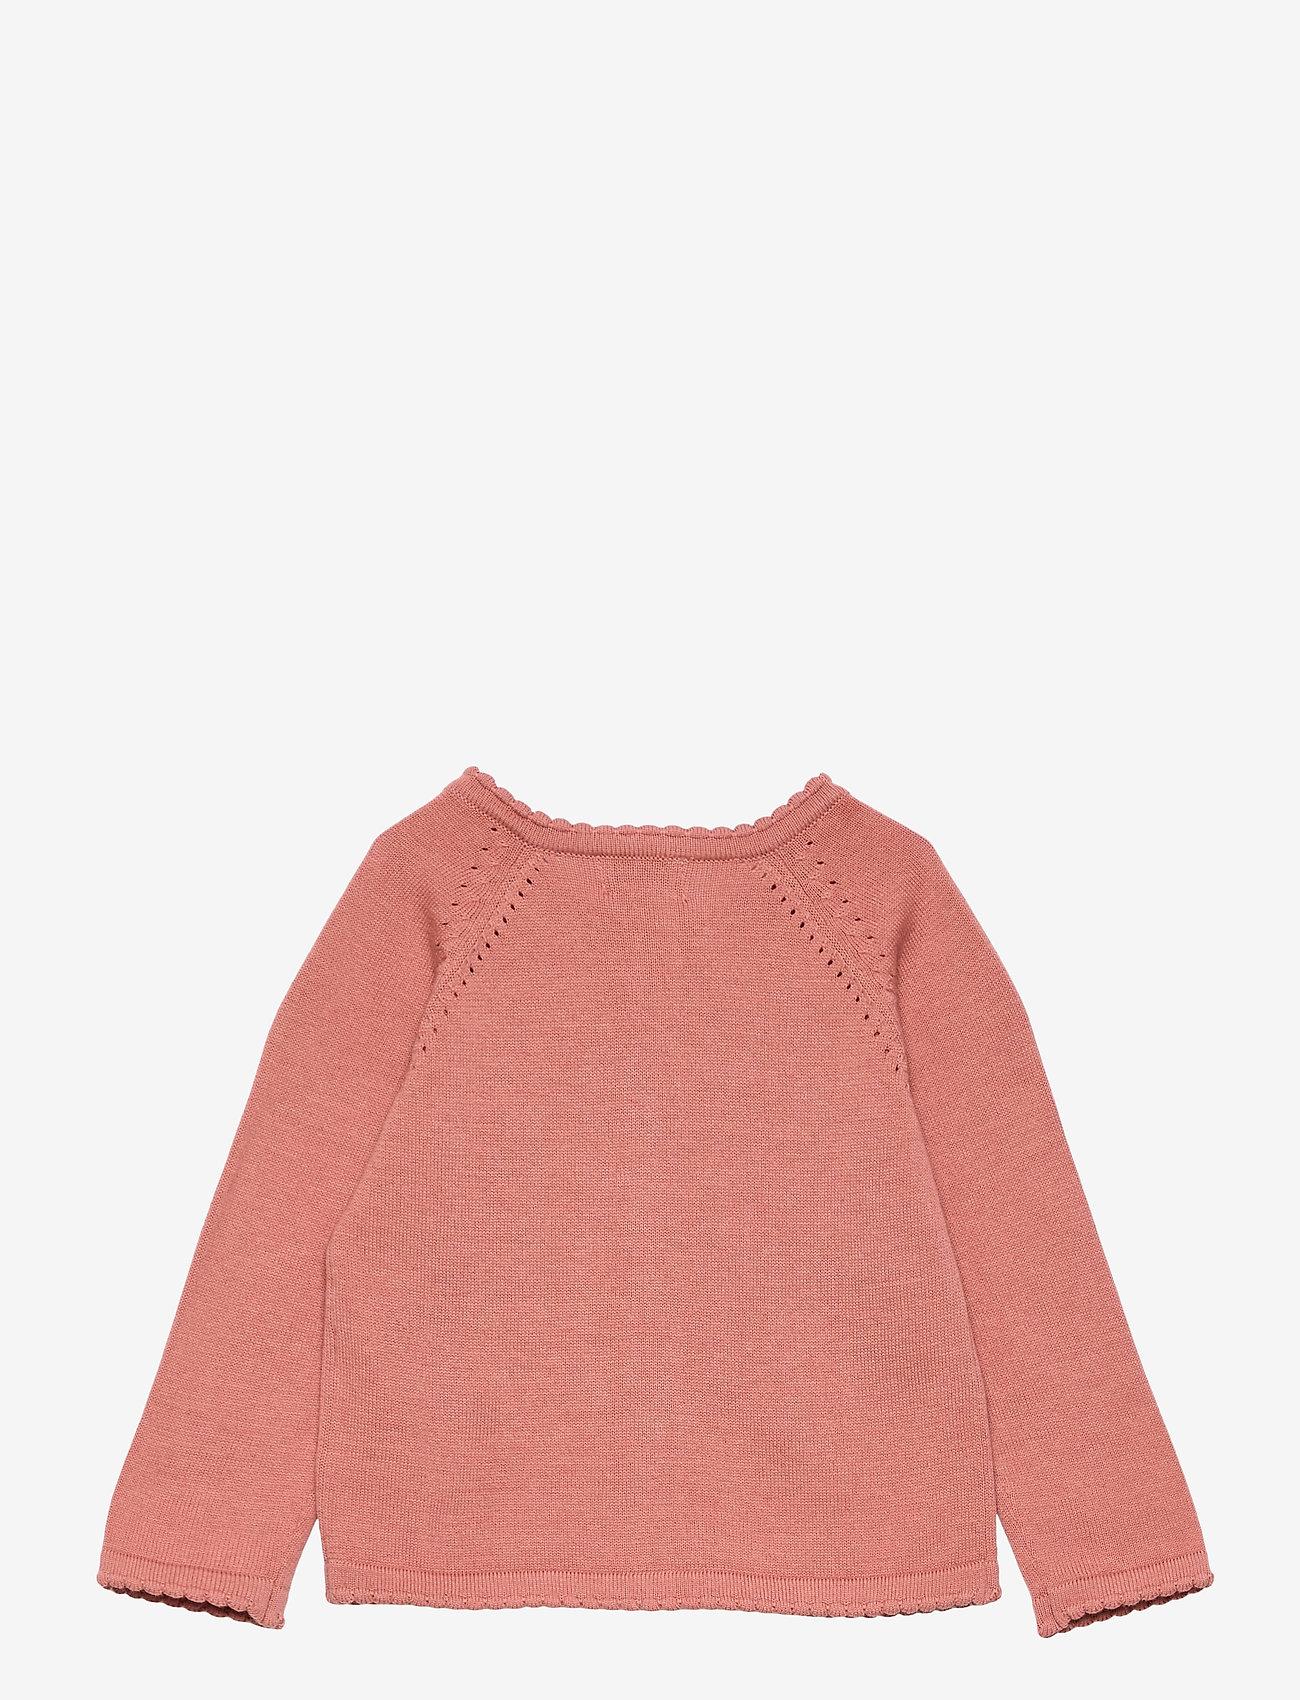 Noa Noa Miniature - Cardigan - gilets - cameo brown - 1